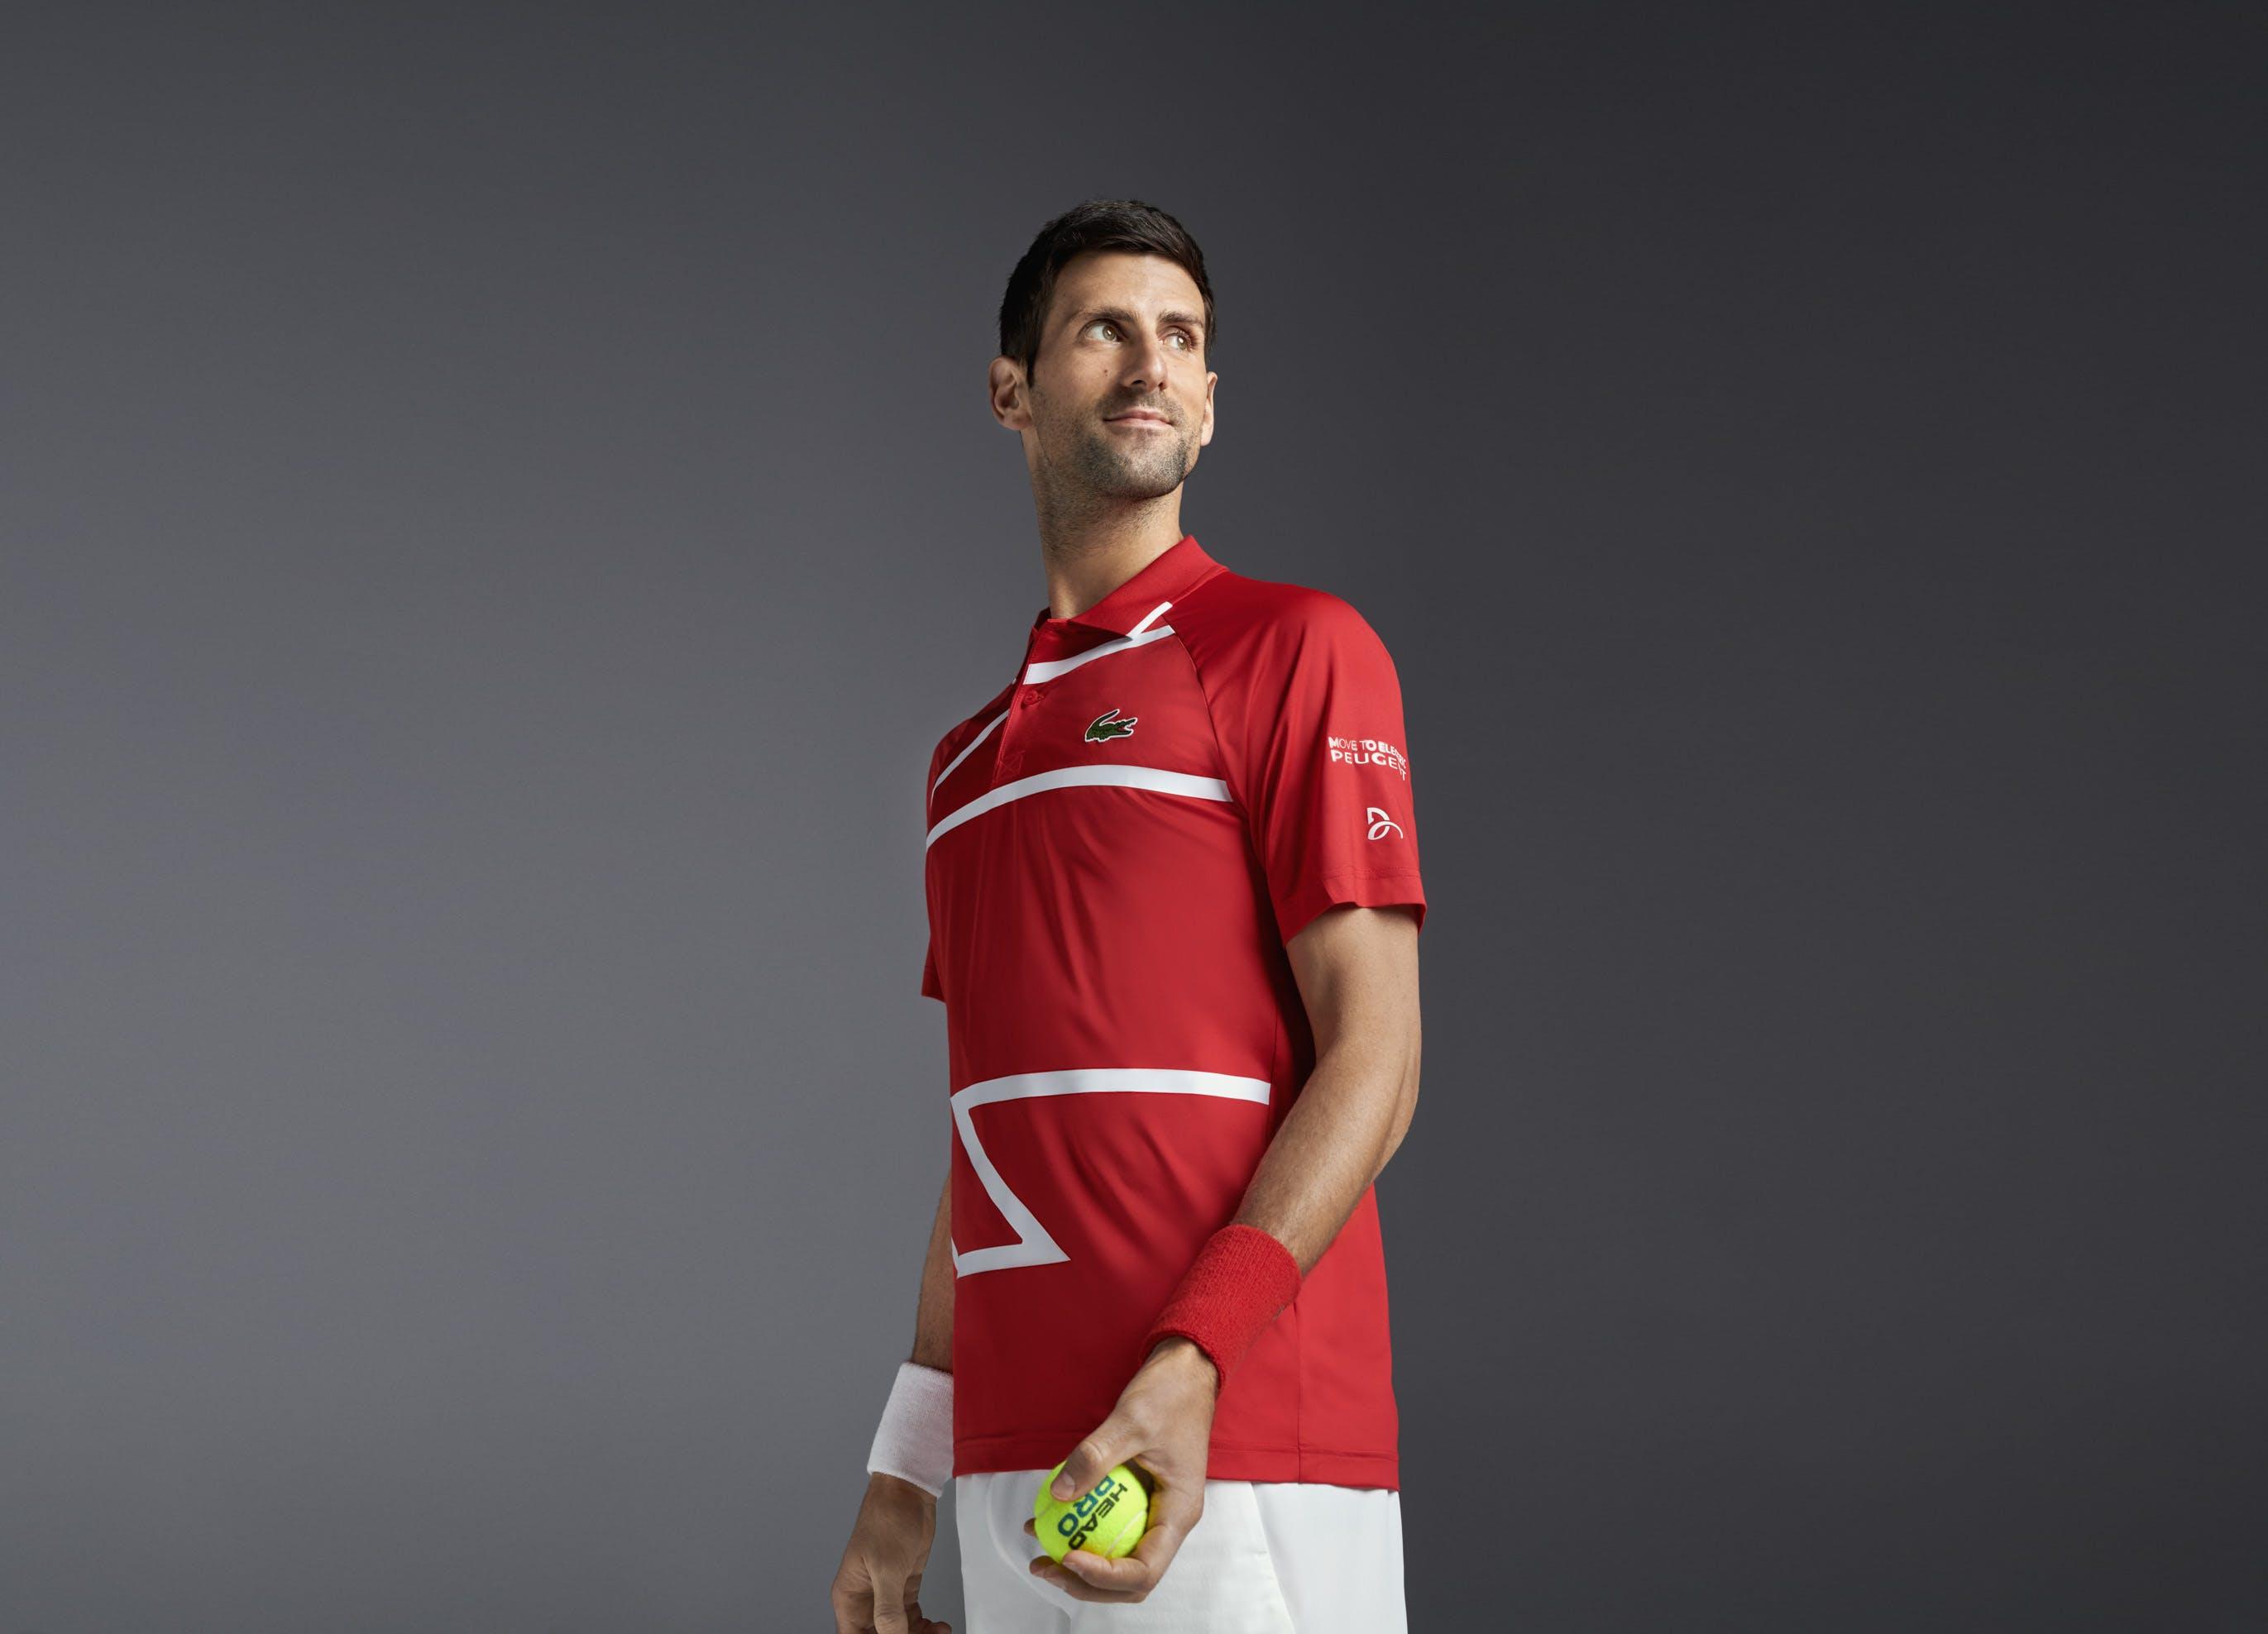 Lacoste Roland-Garros 2020 lifestyle